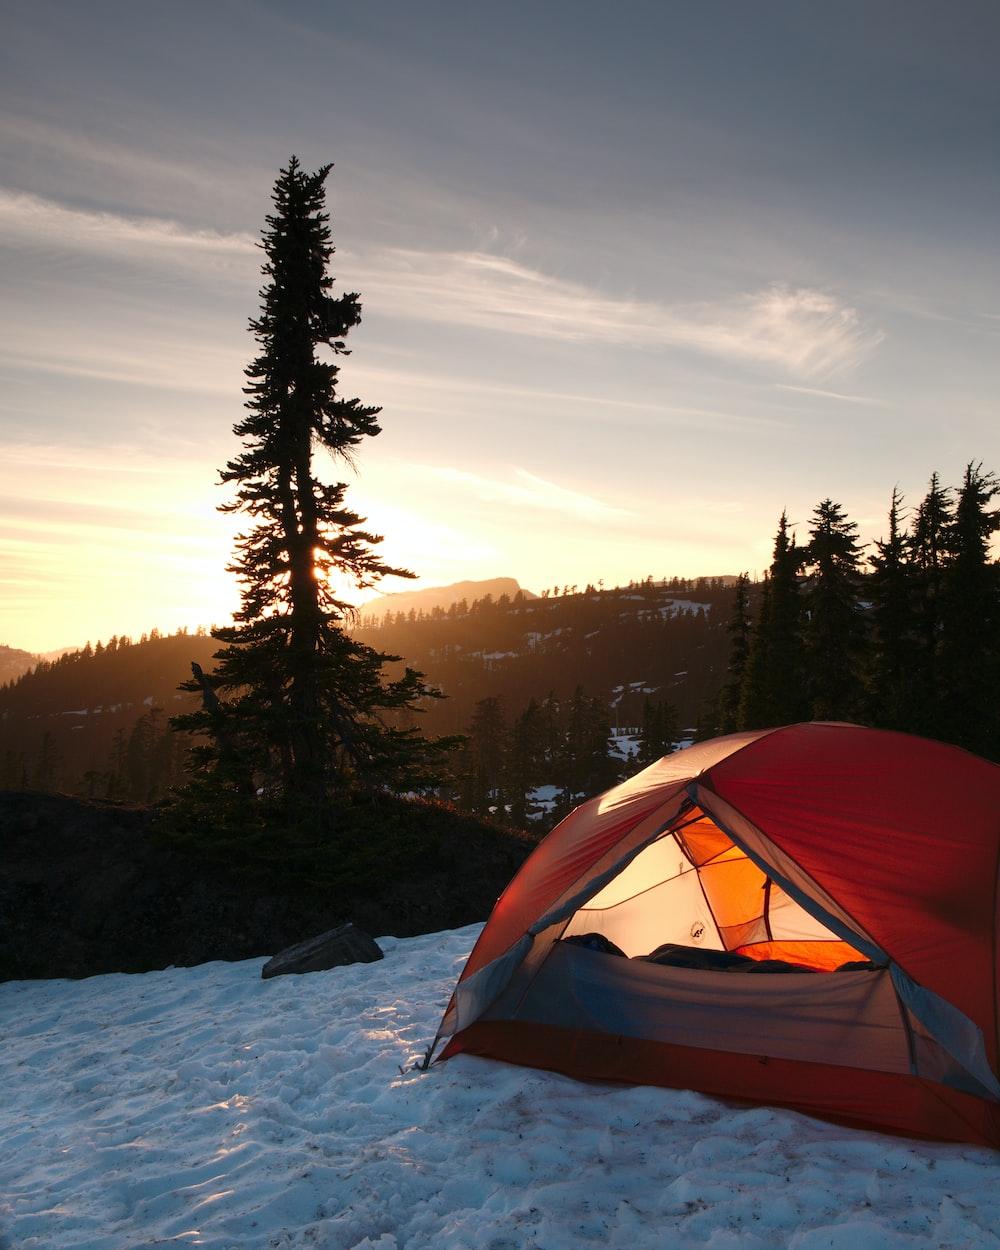 orange dome tent near trees during sunrise